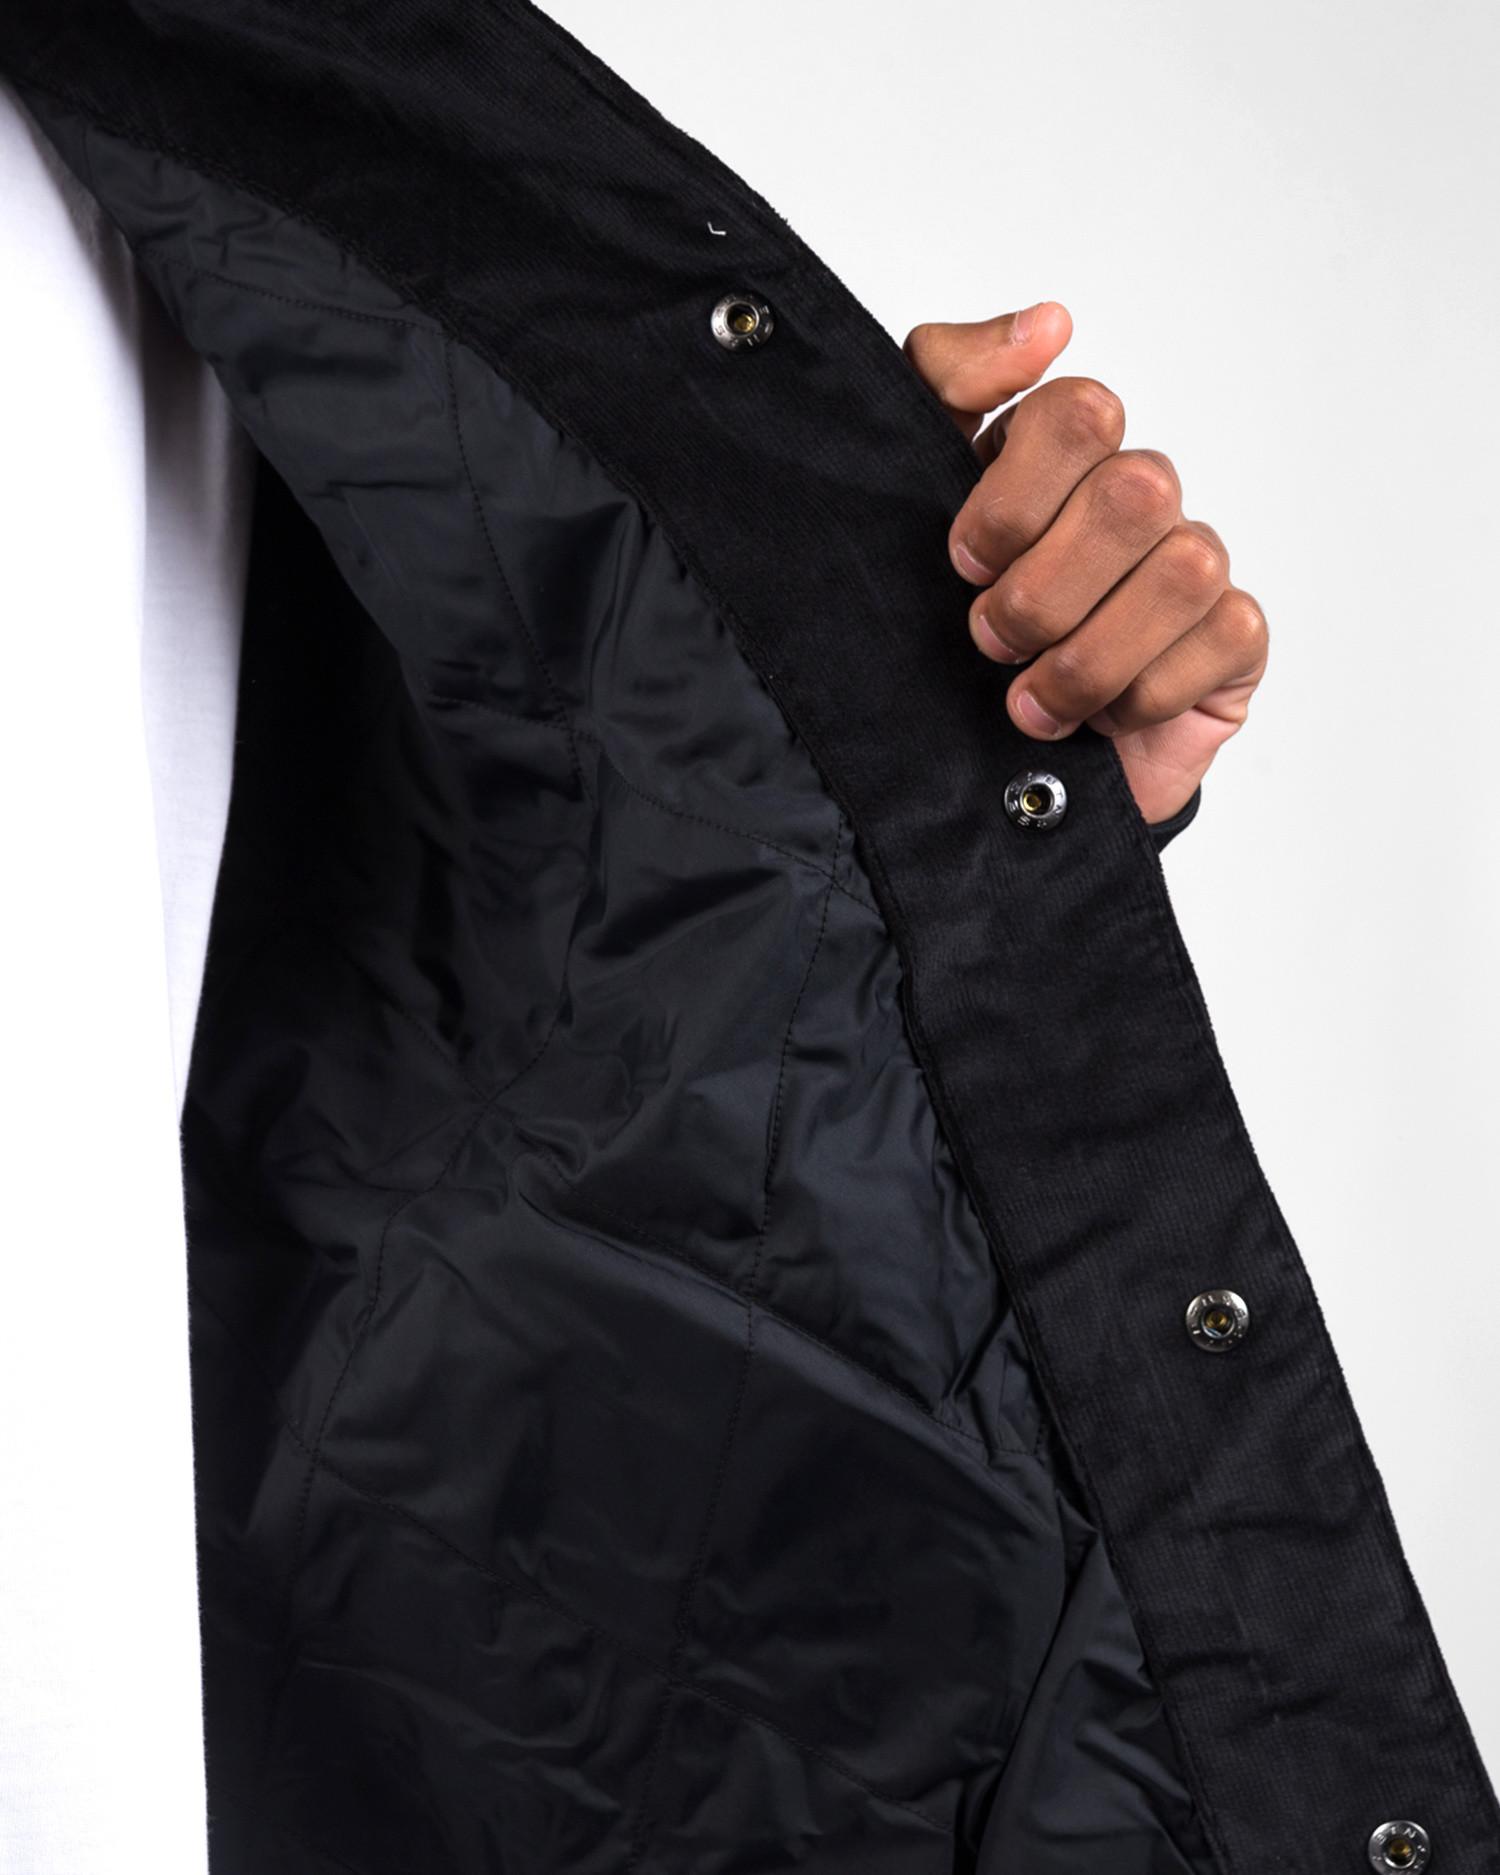 Nike SB Varsity Jacket Black/Black/University Red/Black